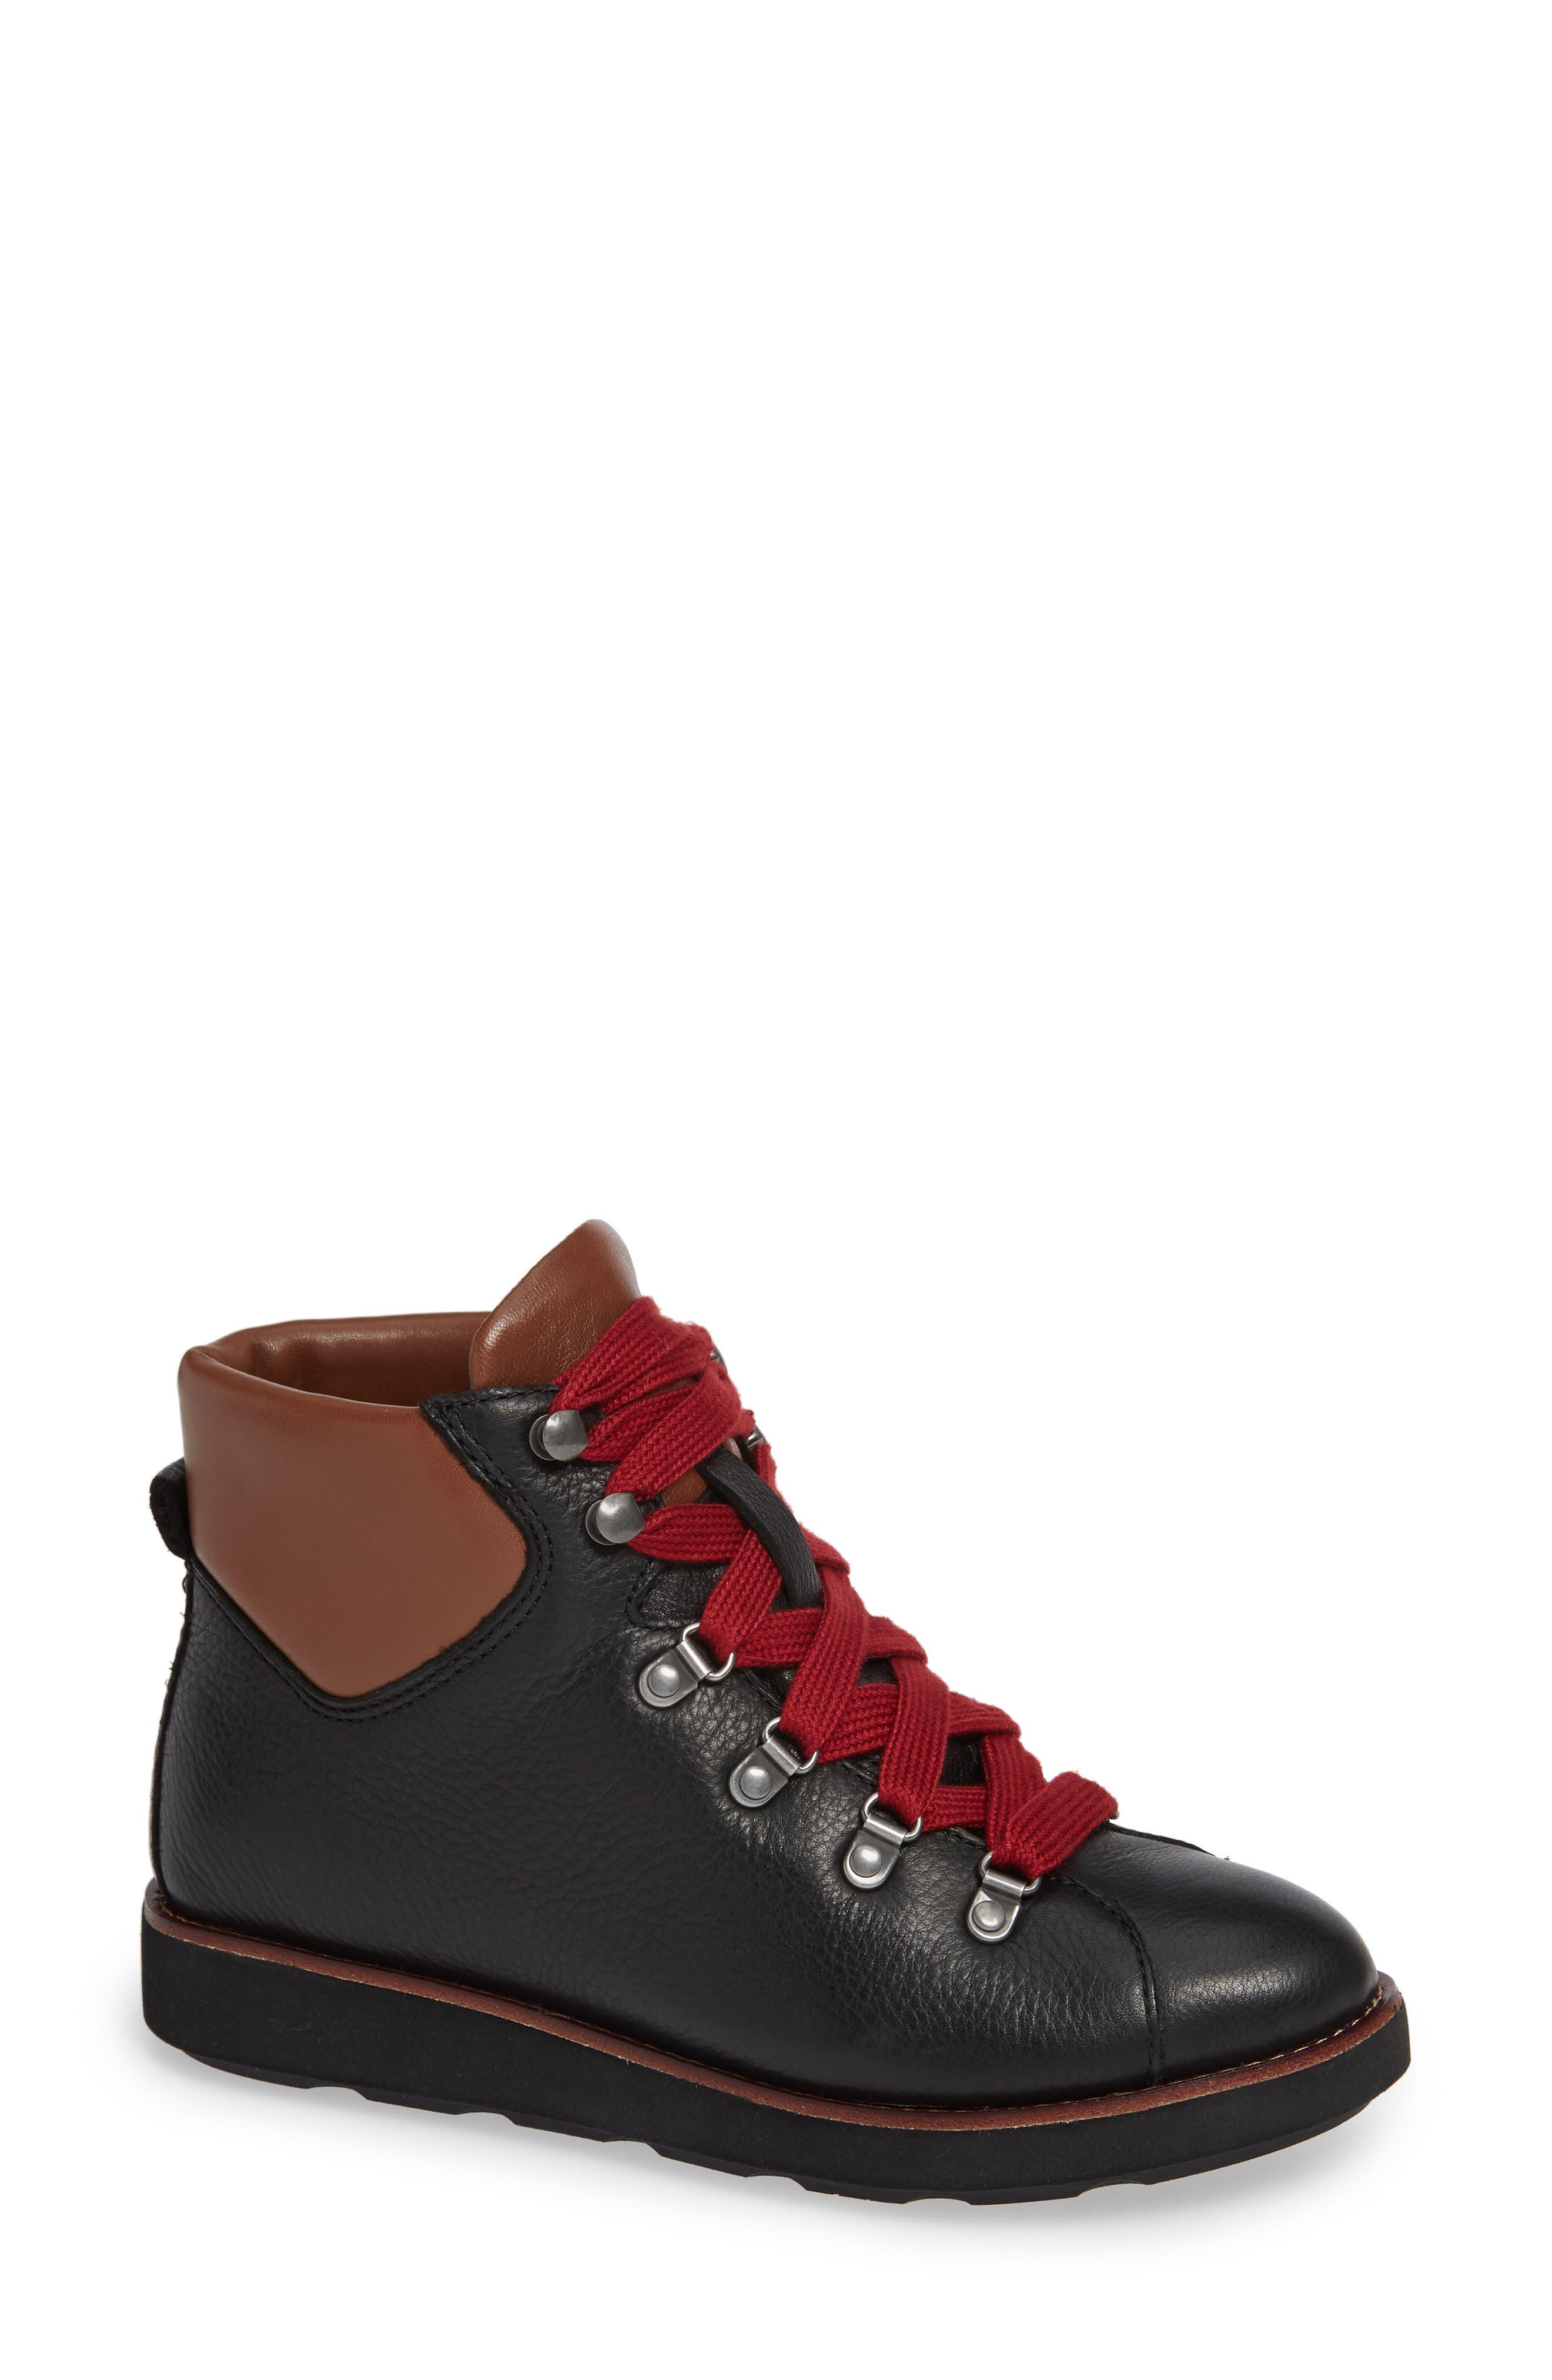 Bionica Natick Lace-Up Boot, Black